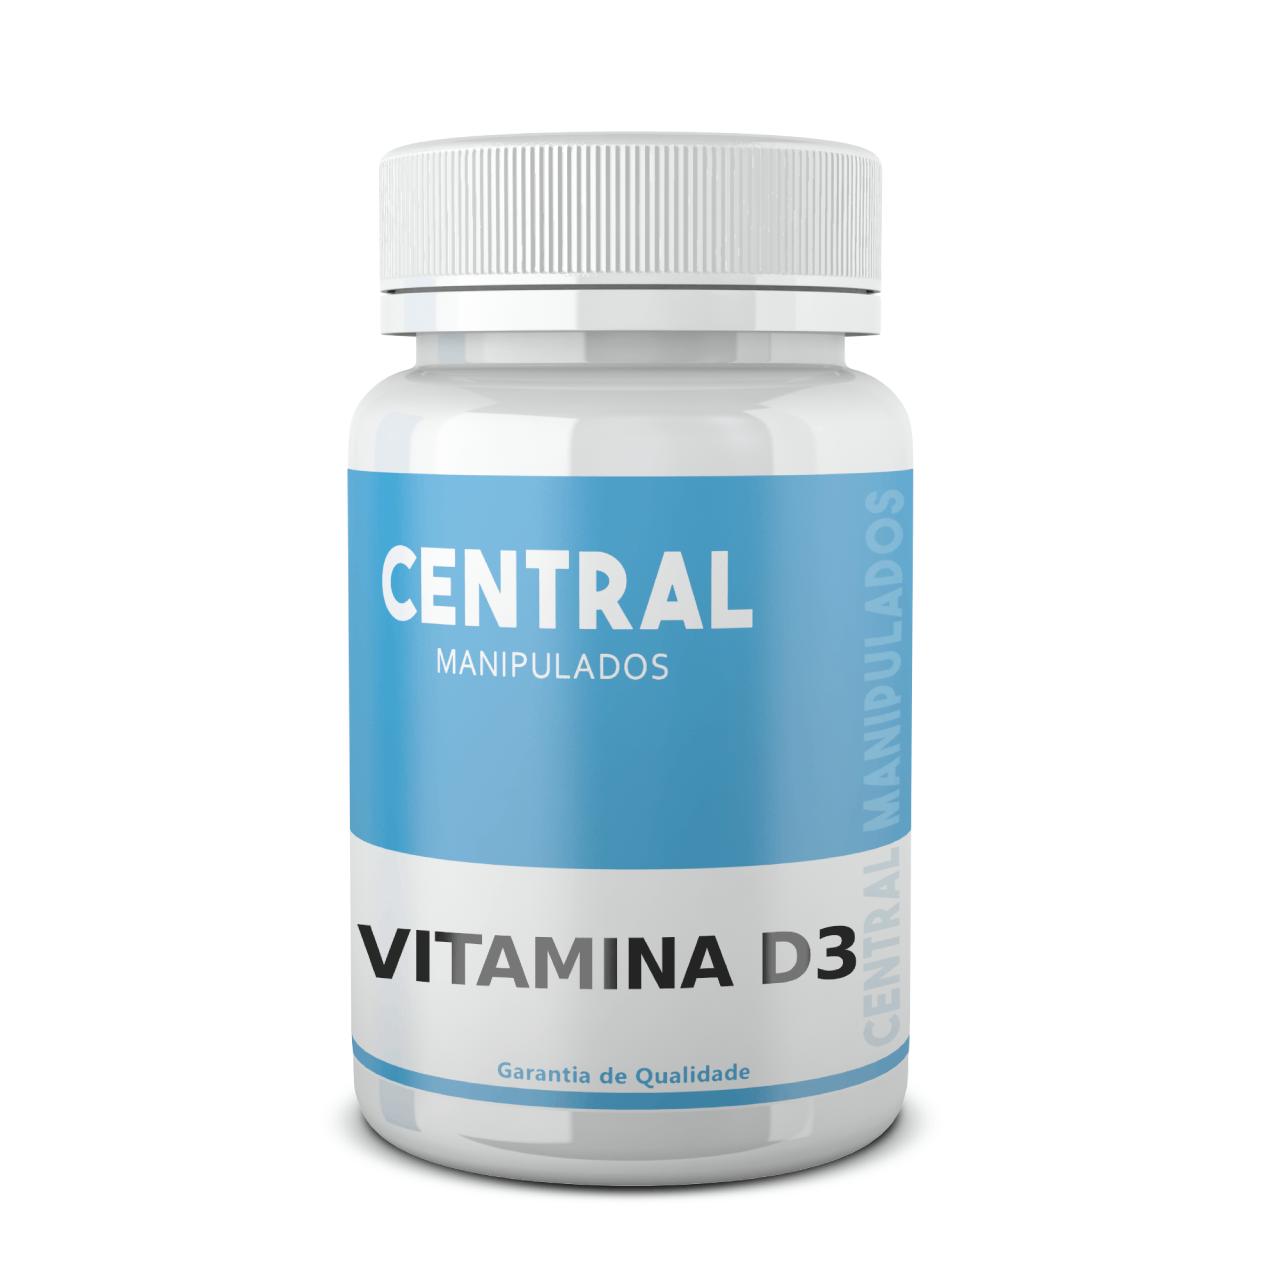 Vitamina D3 5.000 UI - 120 cápsulas - Saúde Óssea e Muscular